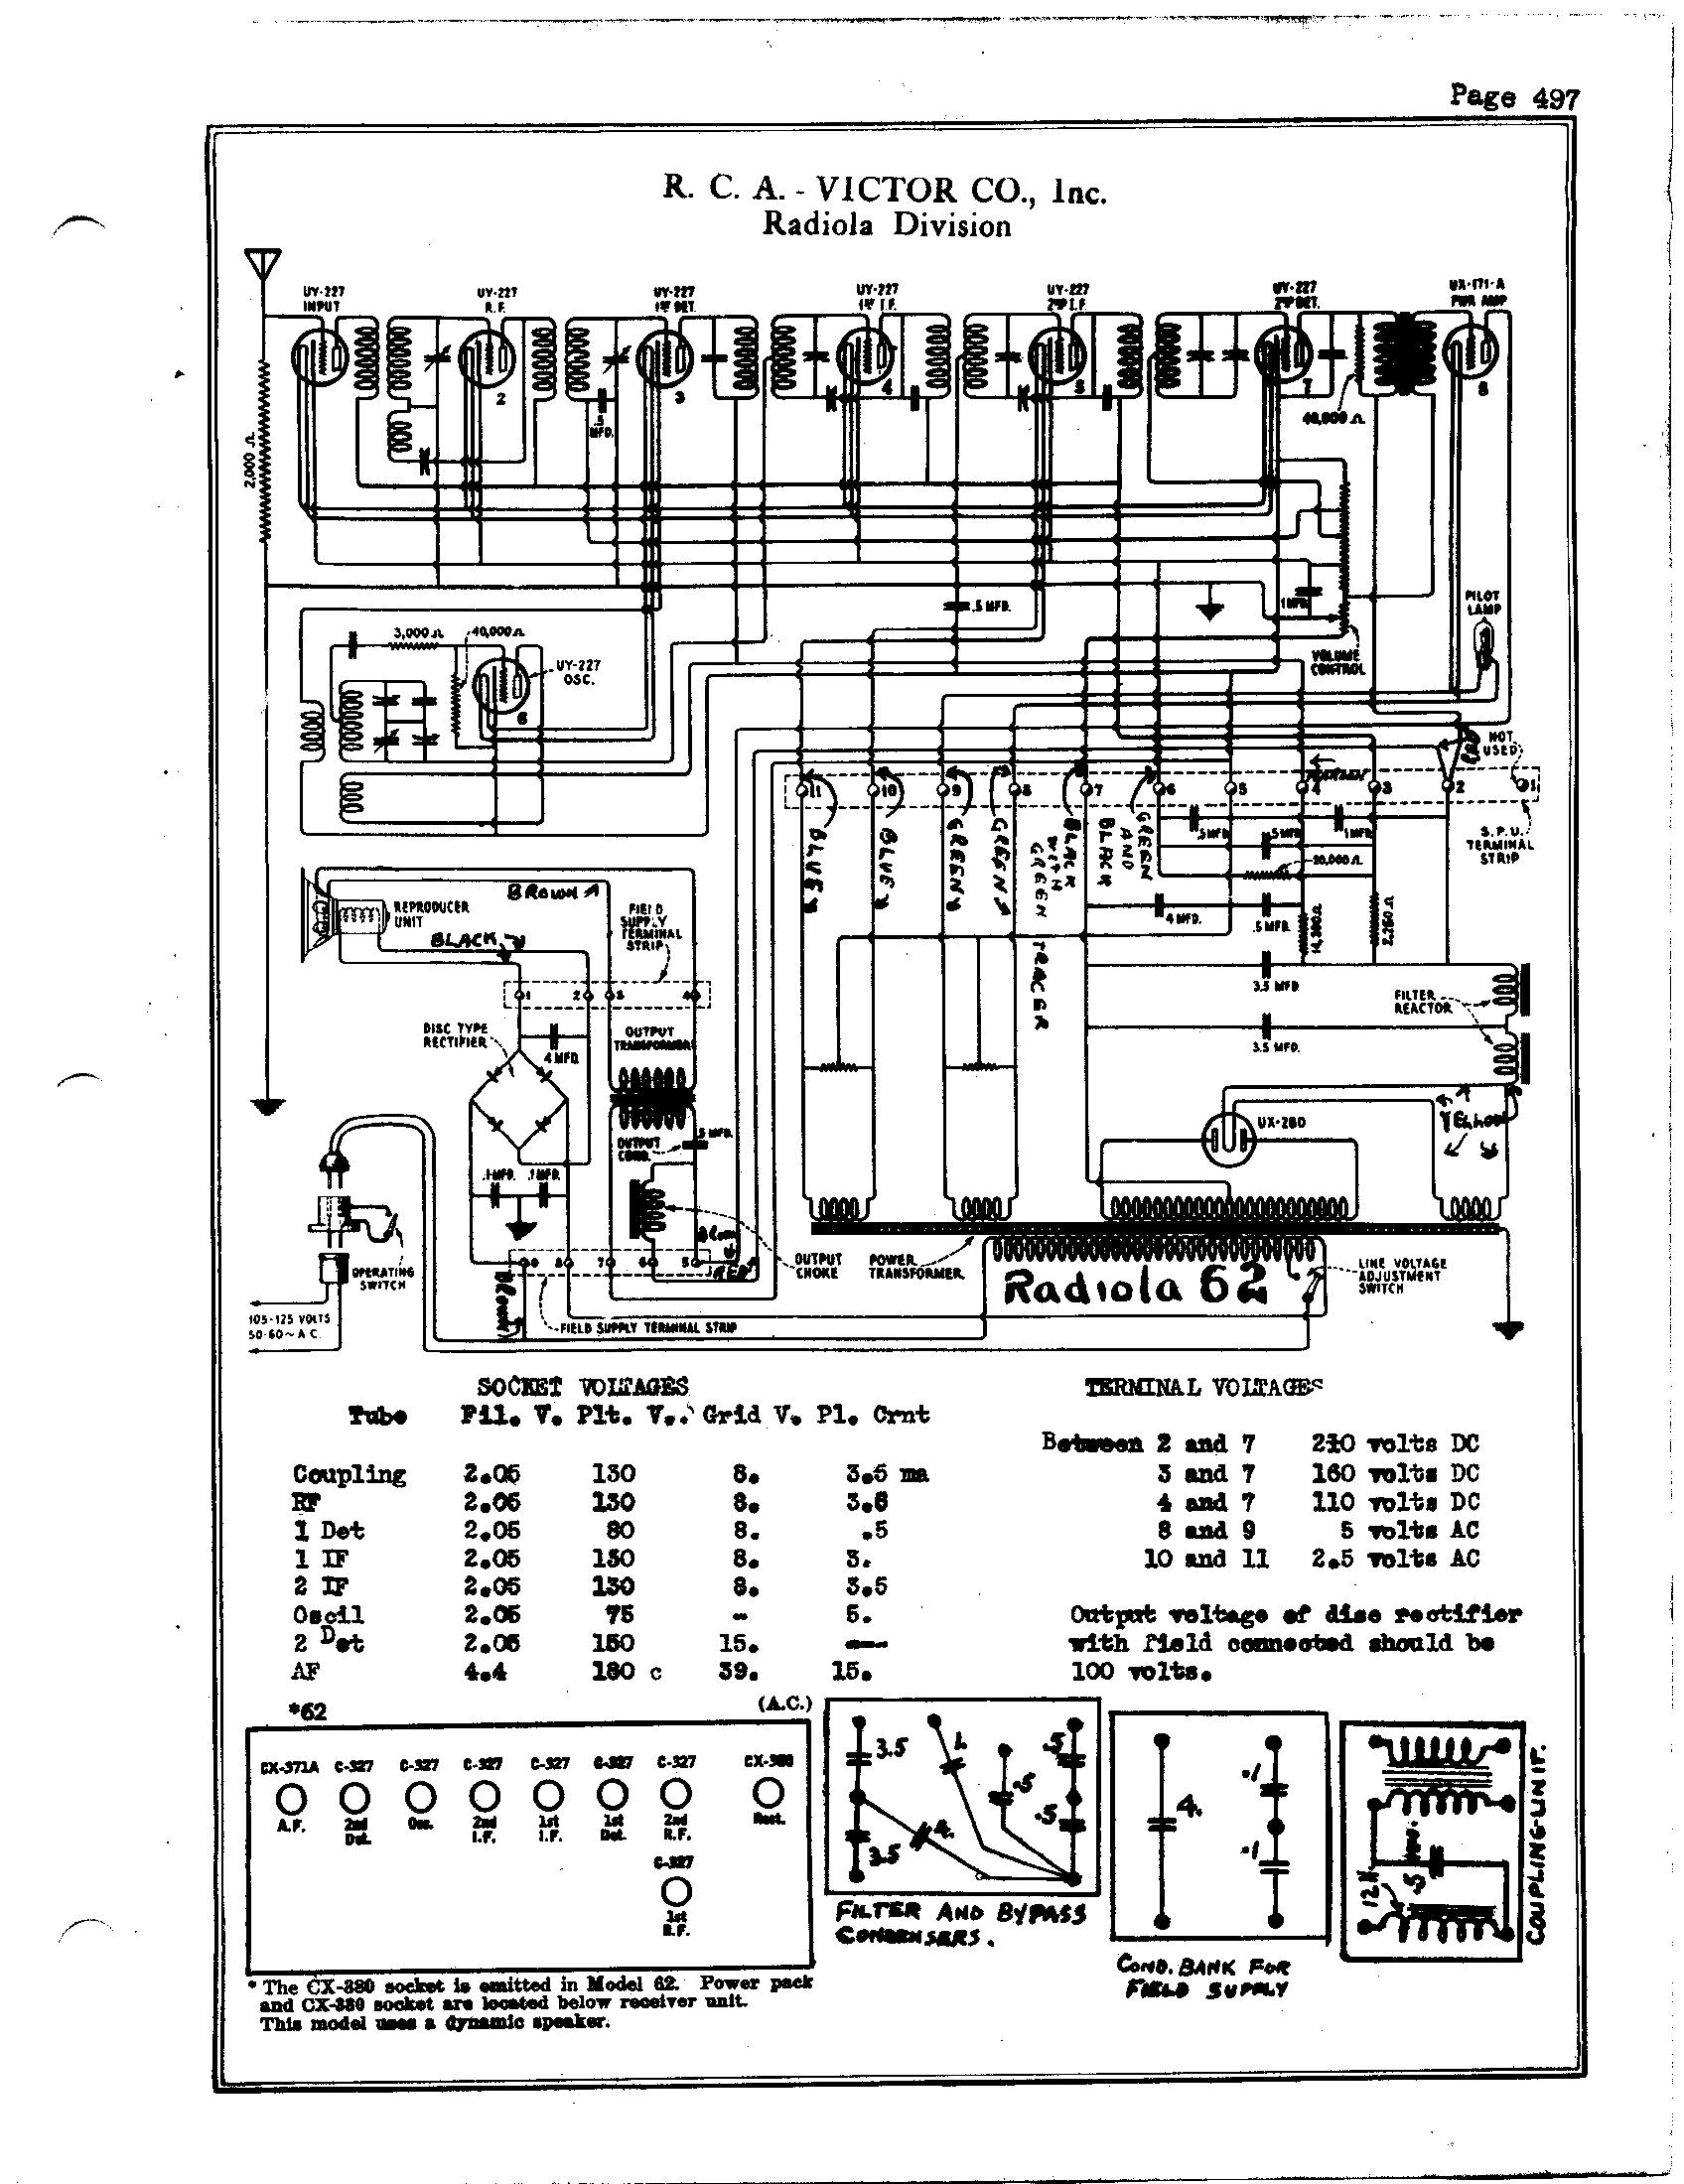 RCA Victor Co., Inc. Radiola 62 Schematic